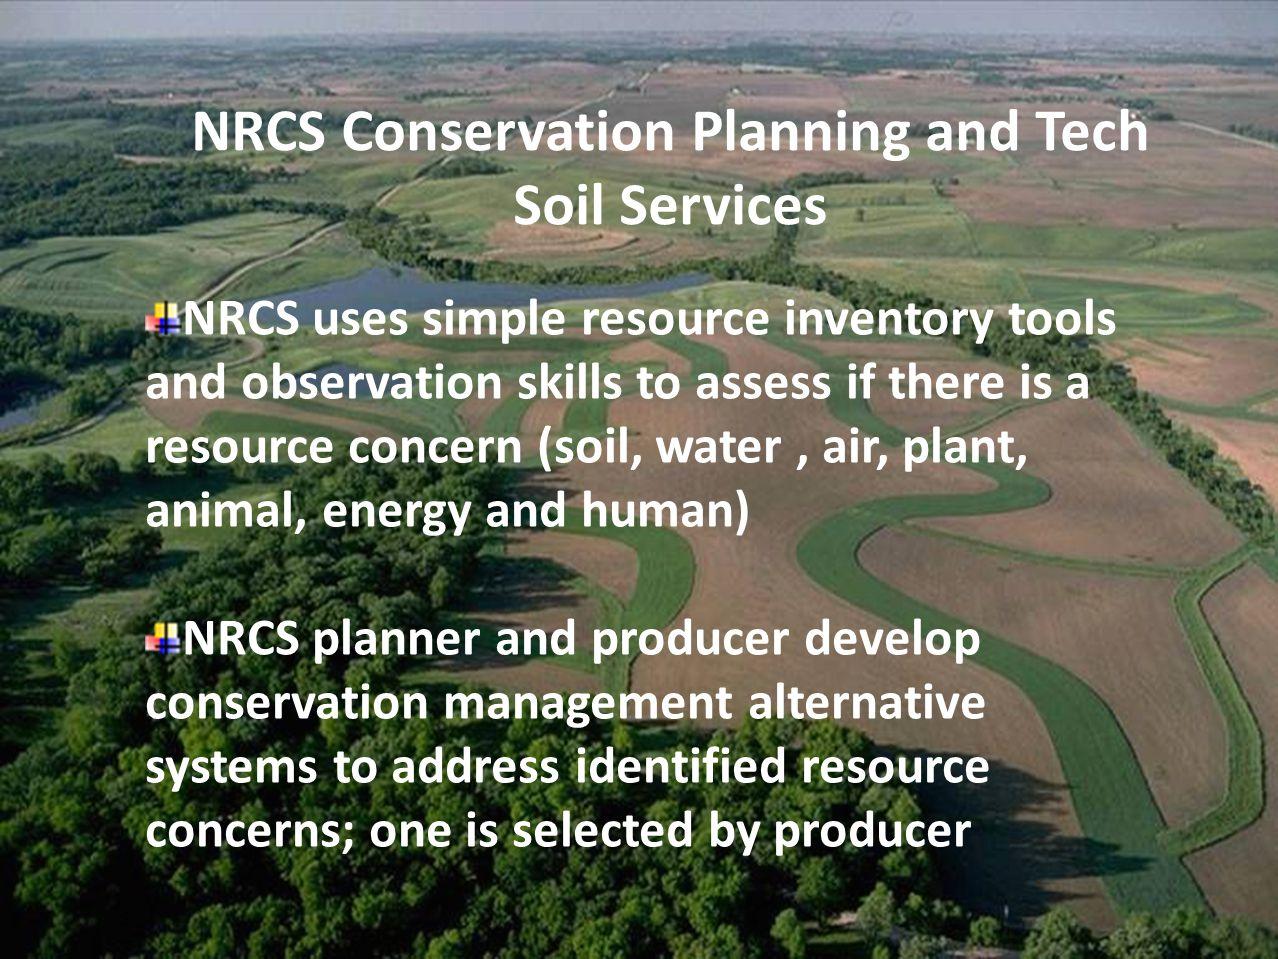 observation to conserve land